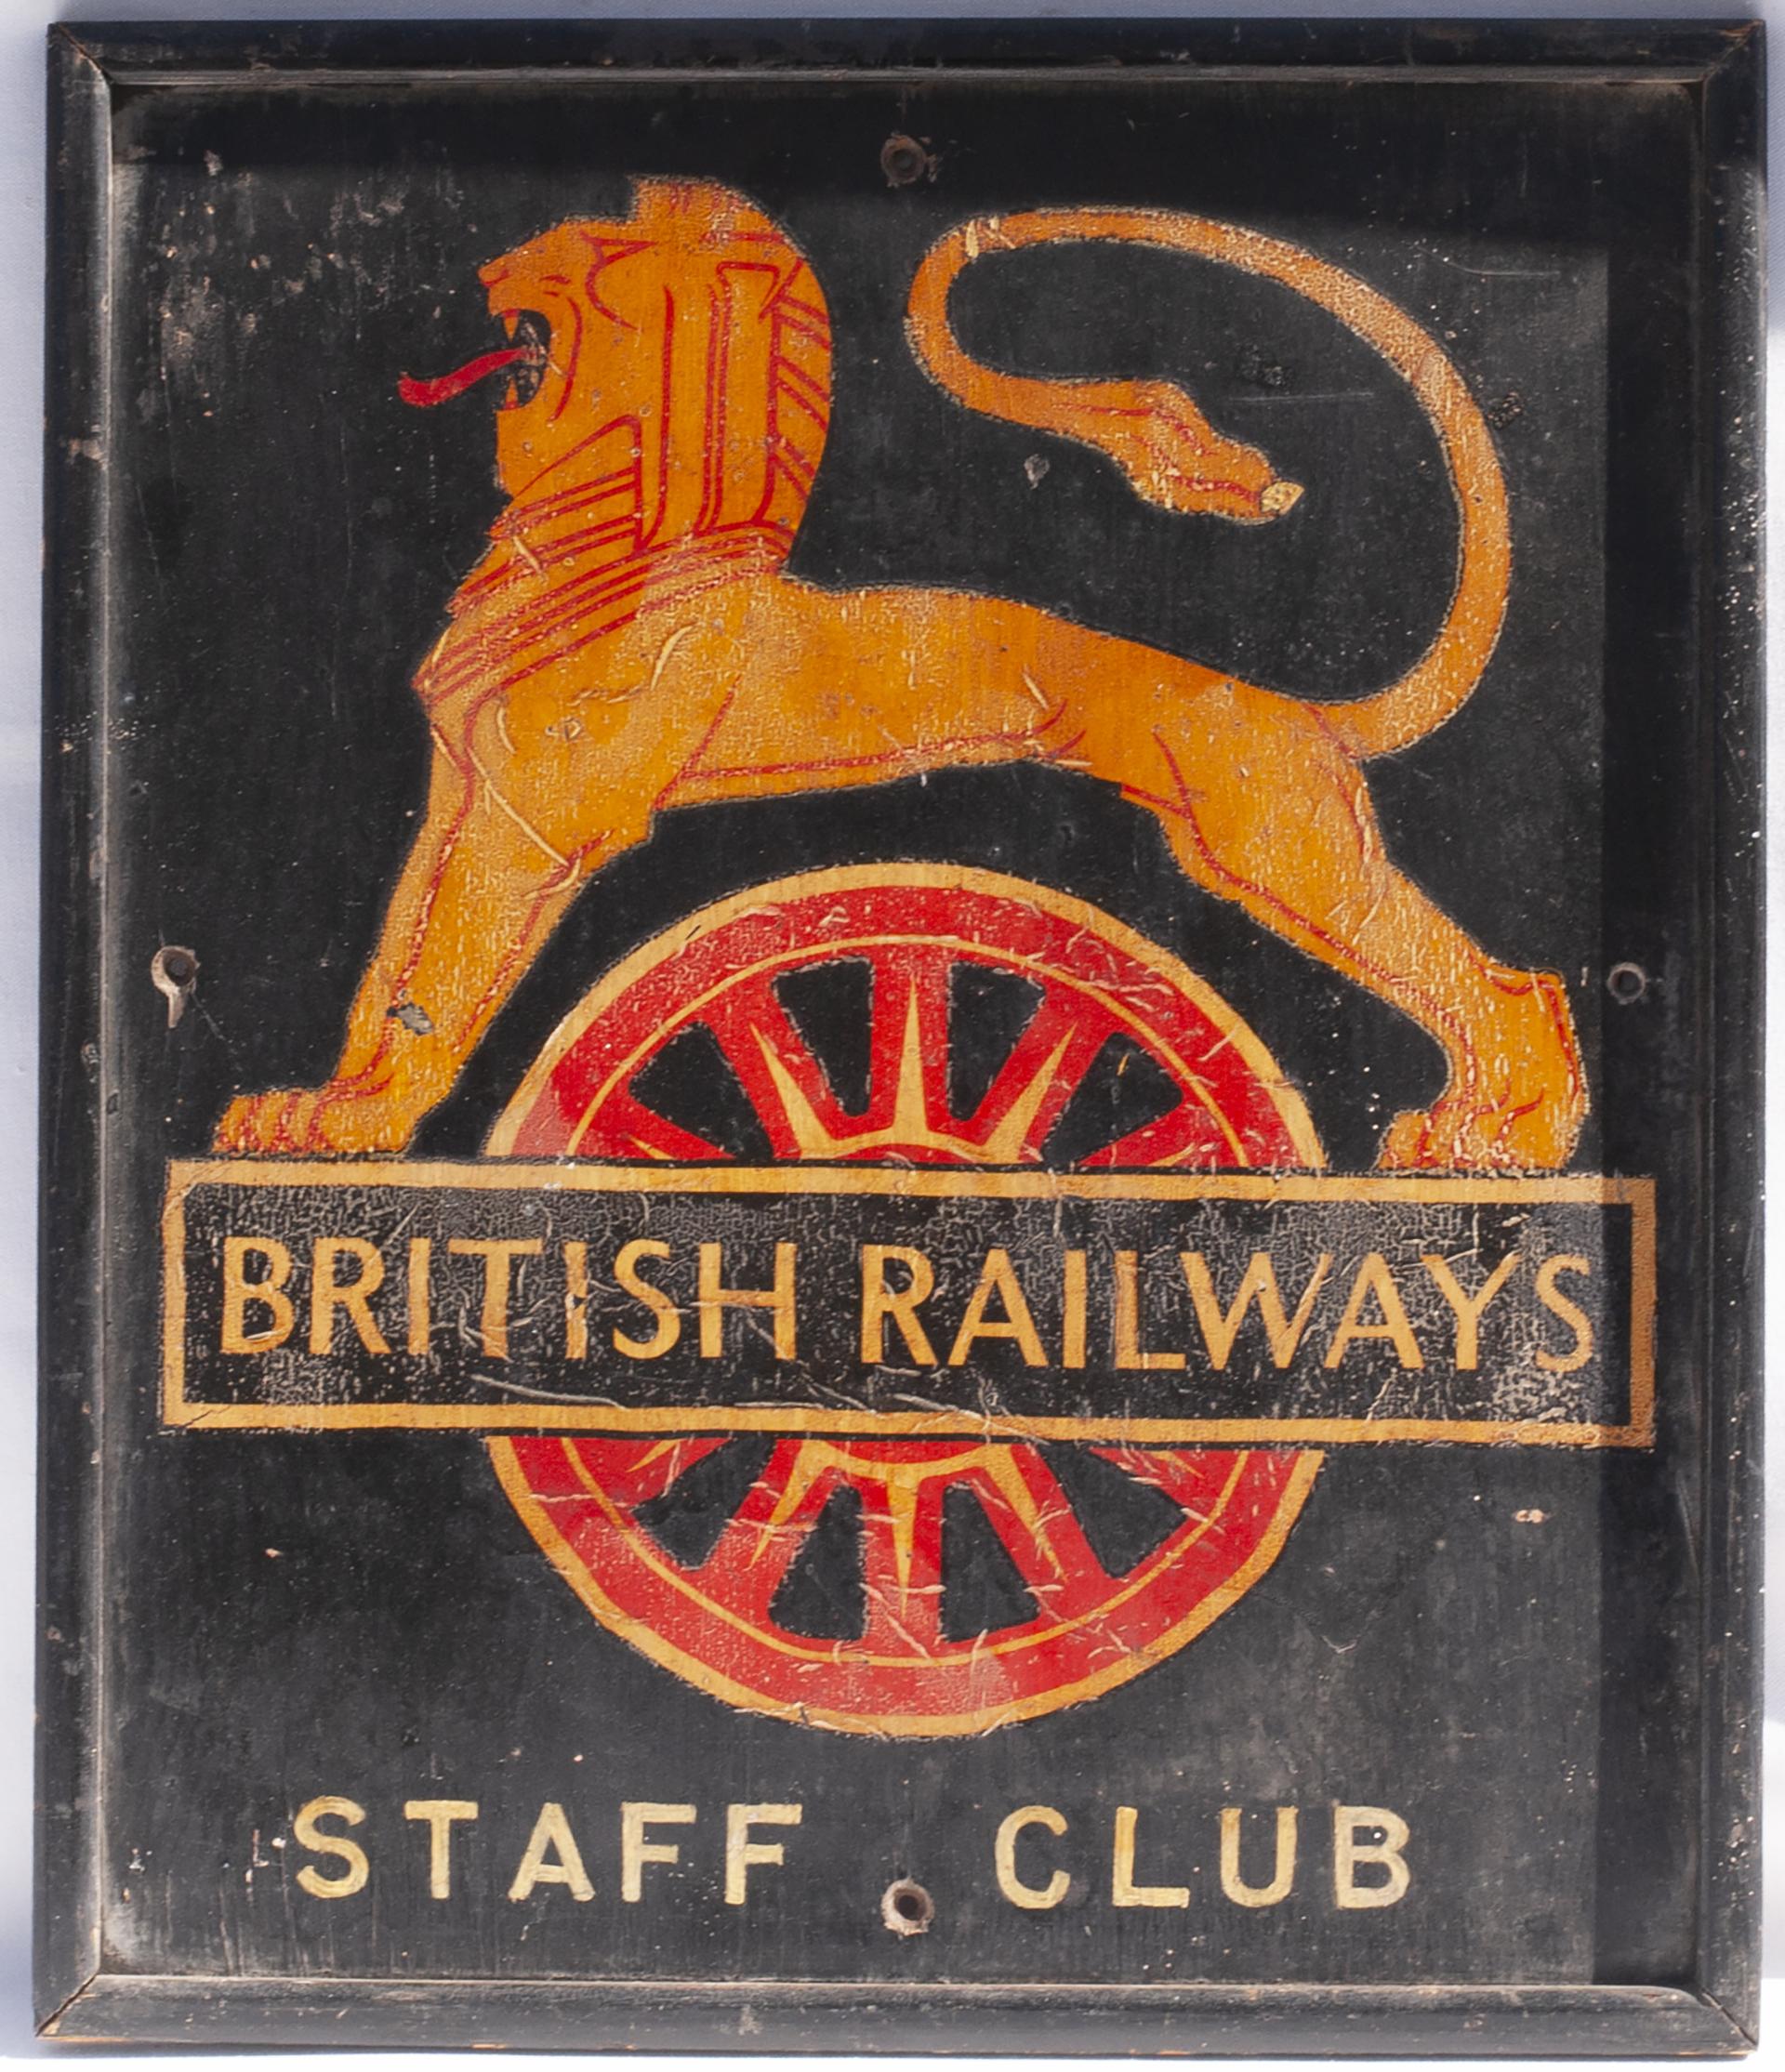 British Railways STAFF CLUB Board. Measures 17.5 in x 20 in.